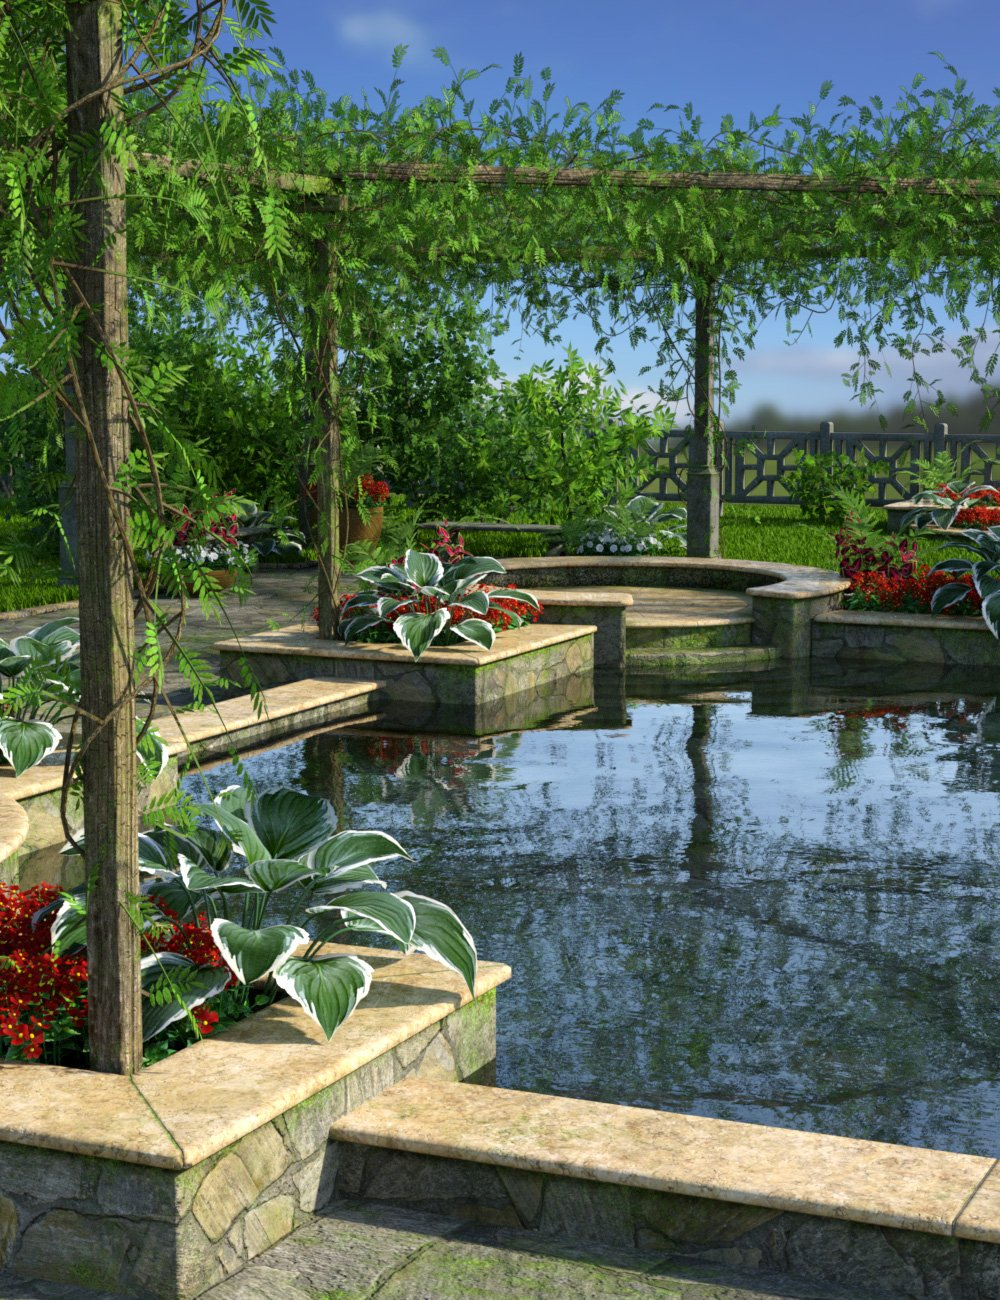 Romantic Pool by: esha, 3D Models by Daz 3D